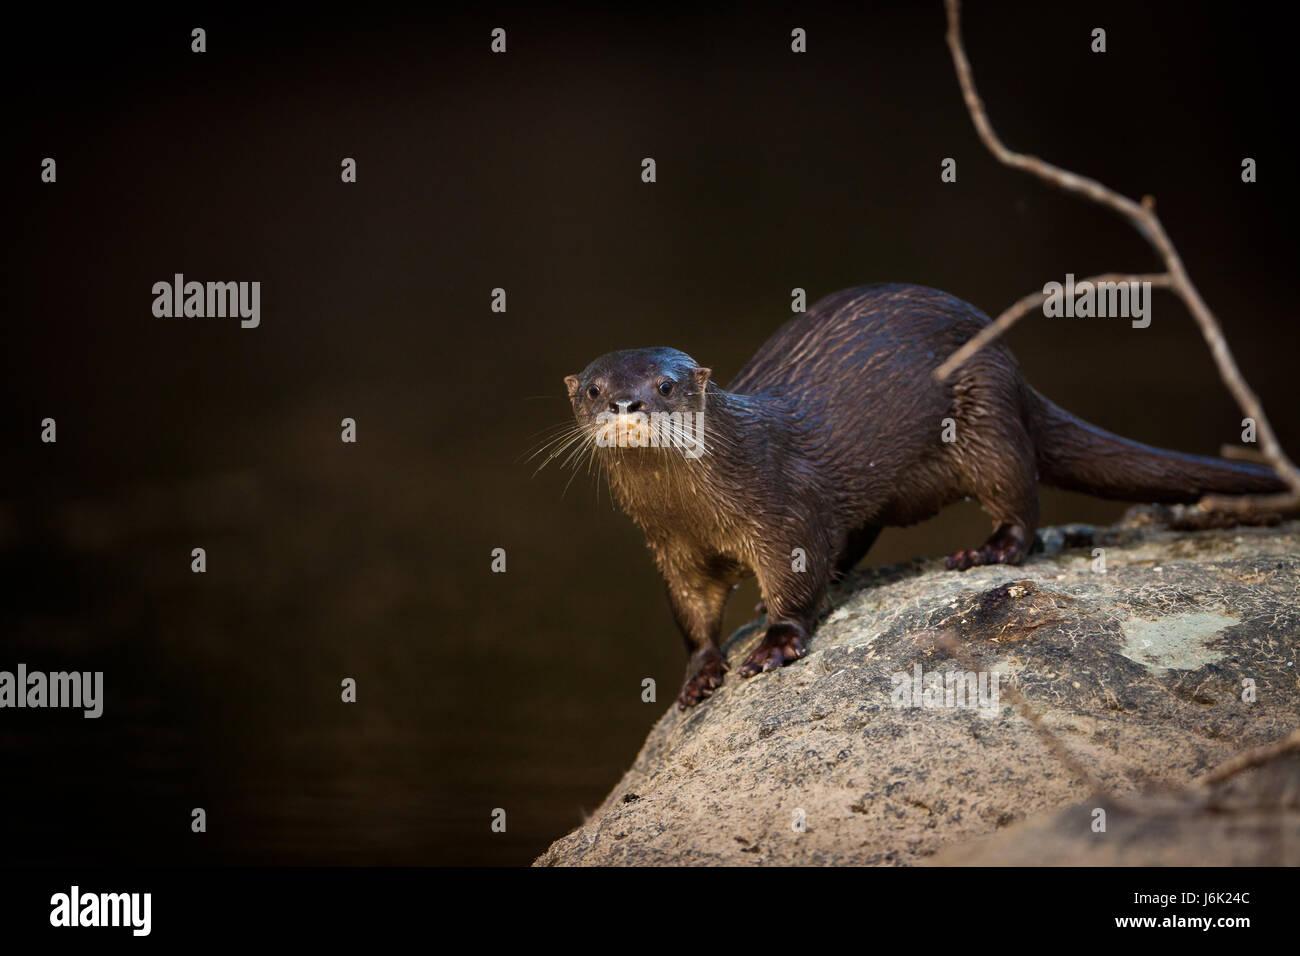 Neotropical River Otter, sci.name; Lontra longicaudis, Cocle province, Republic of Panama. Stock Photo